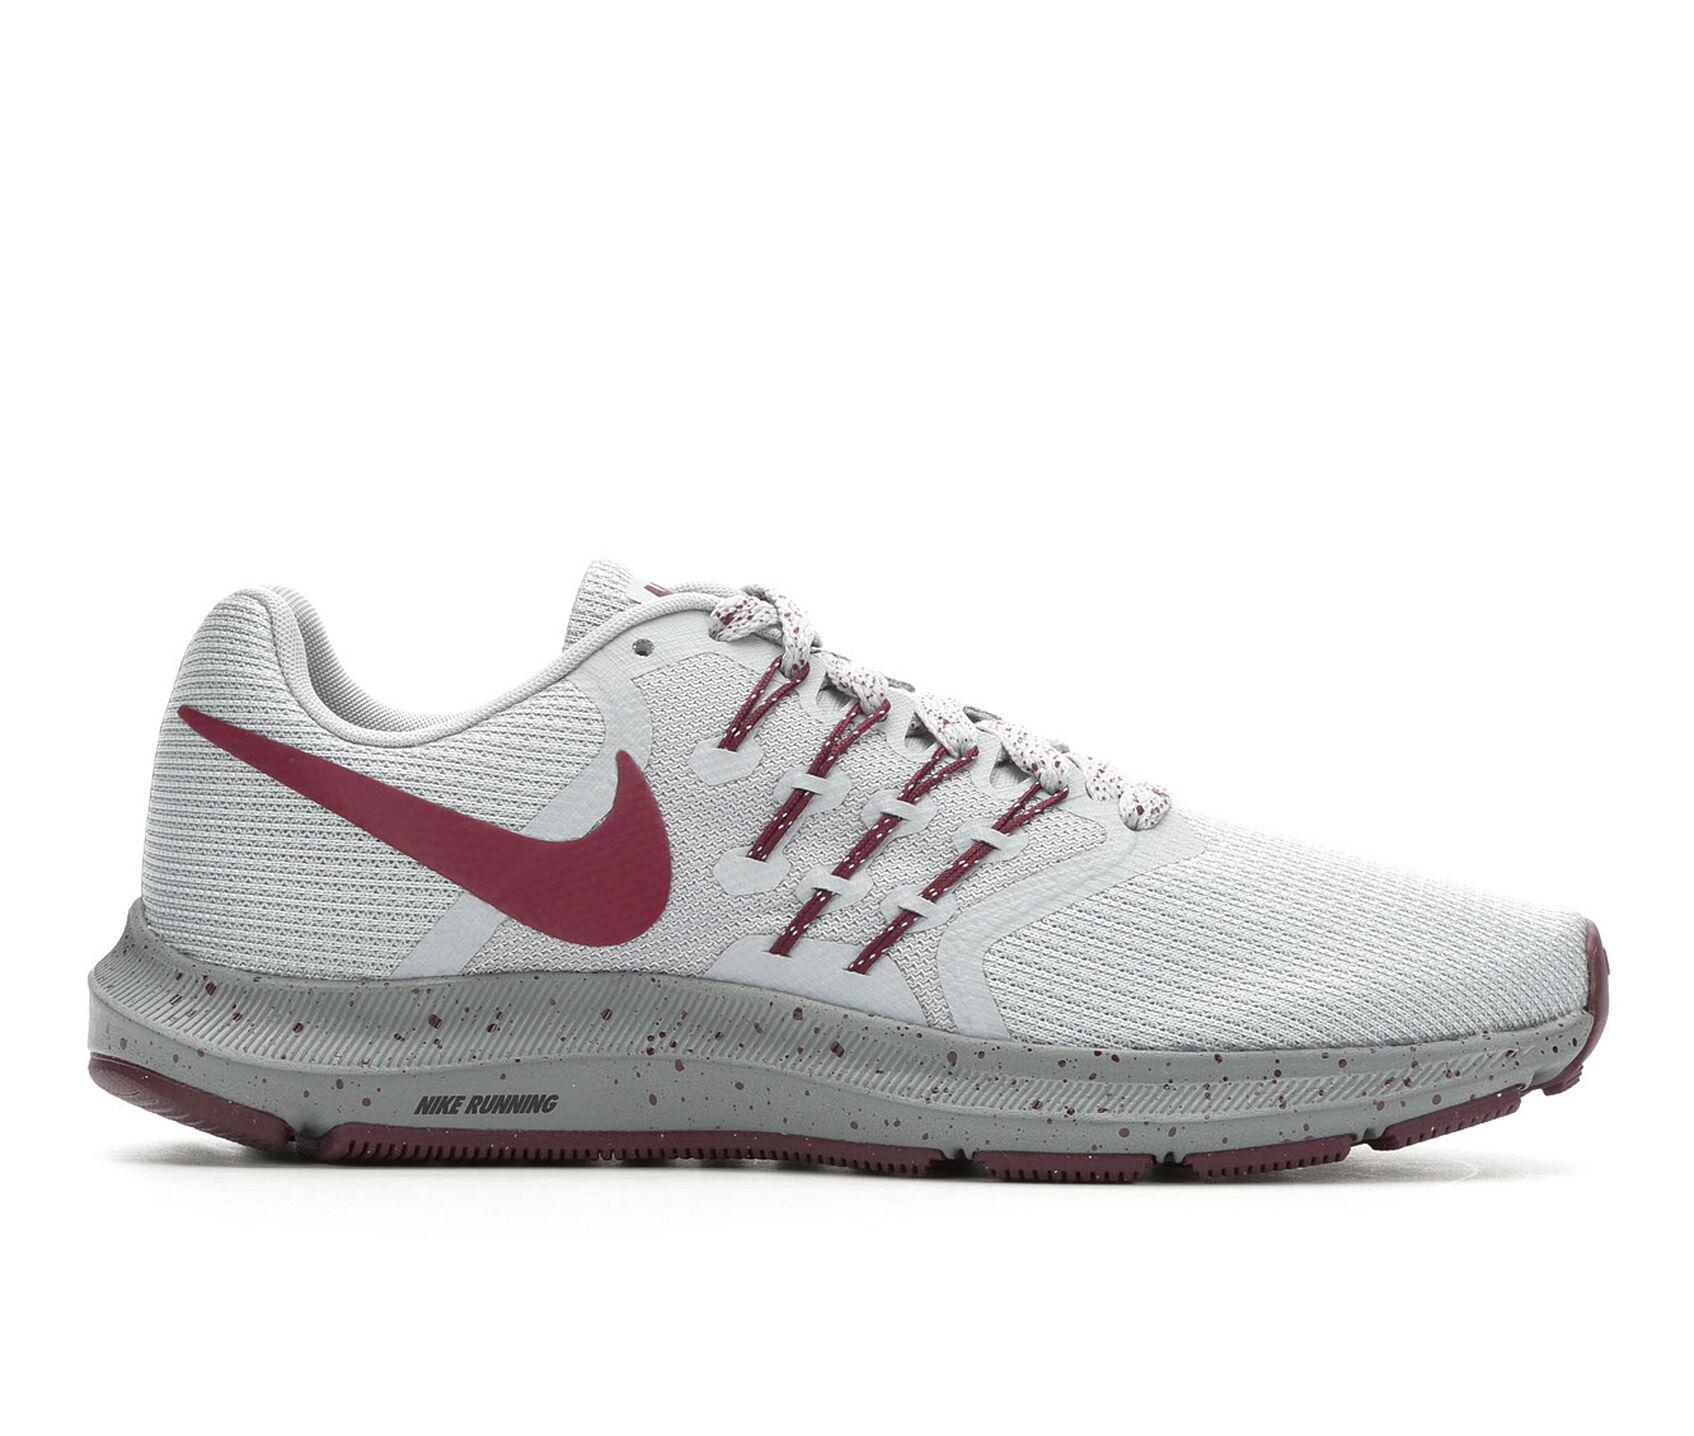 competitive price 91077 b9509 Women's Nike Run Swift SE Running Shoes